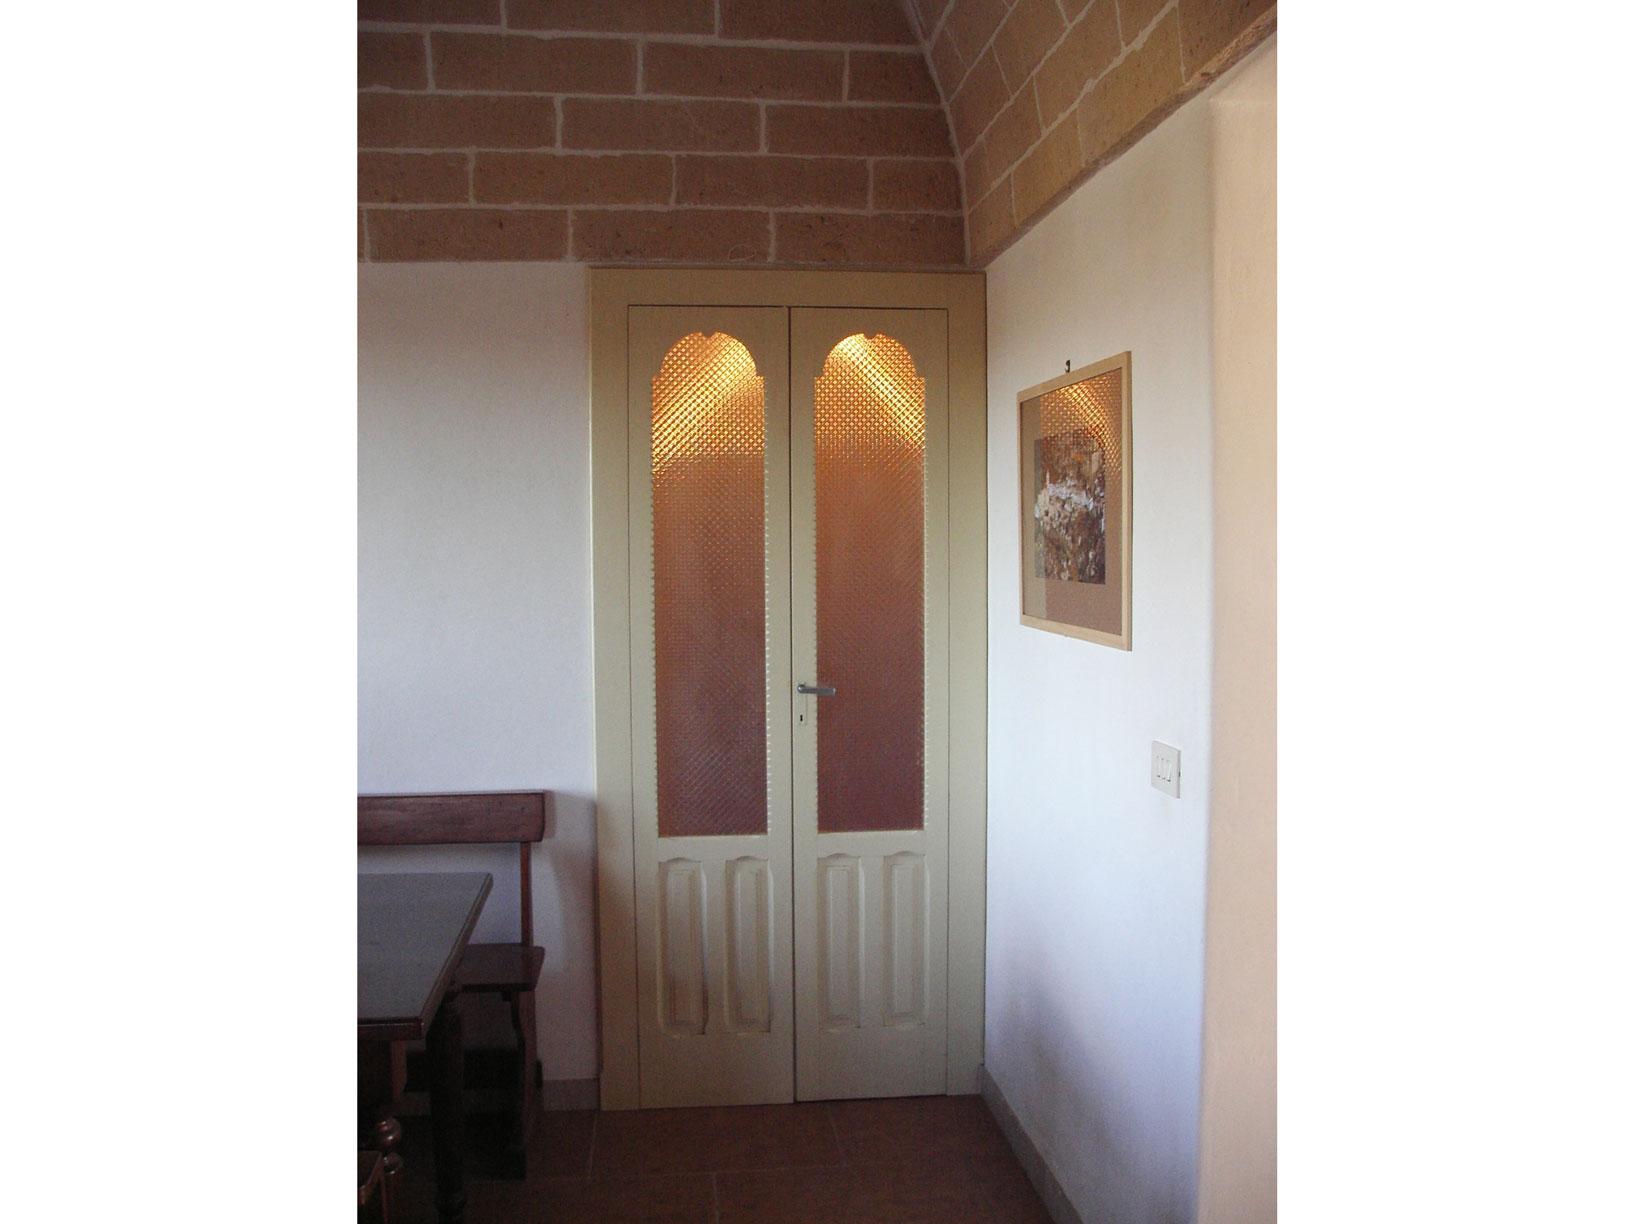 Porta interna - Internal door - Porte intérieure